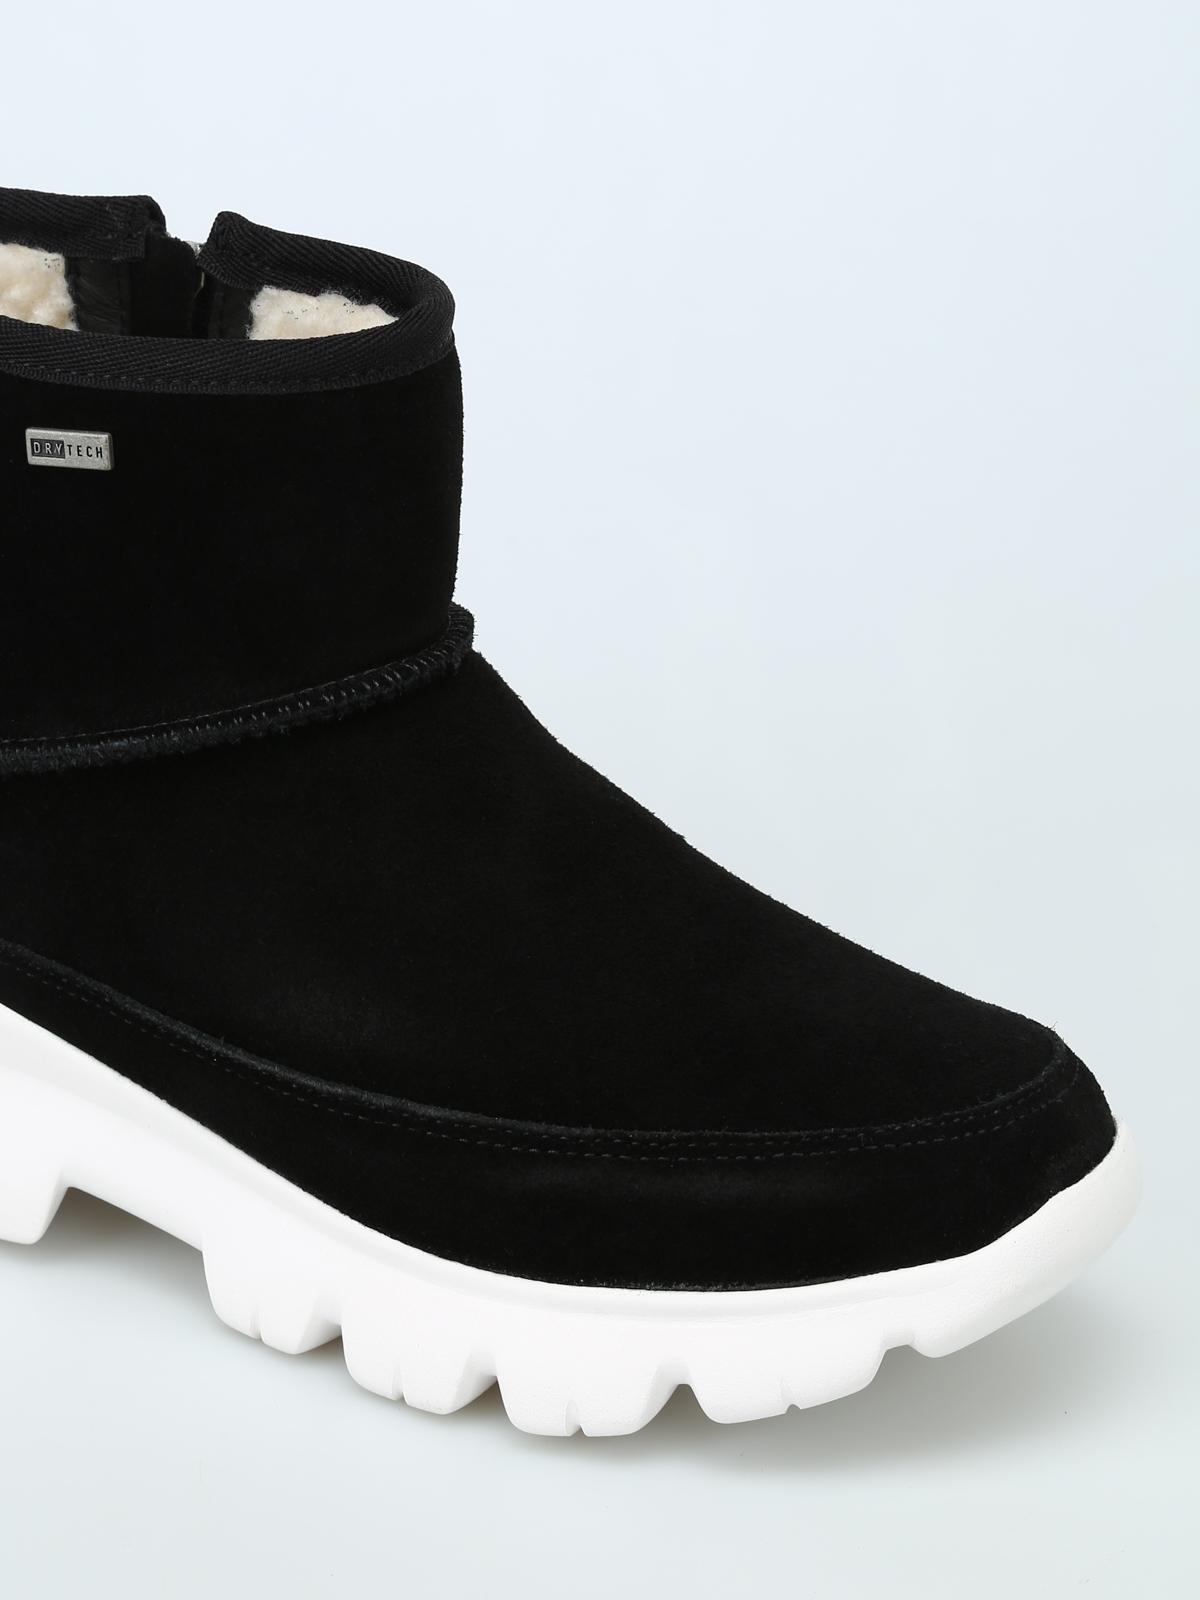 waterproof suede booties - ankle boots